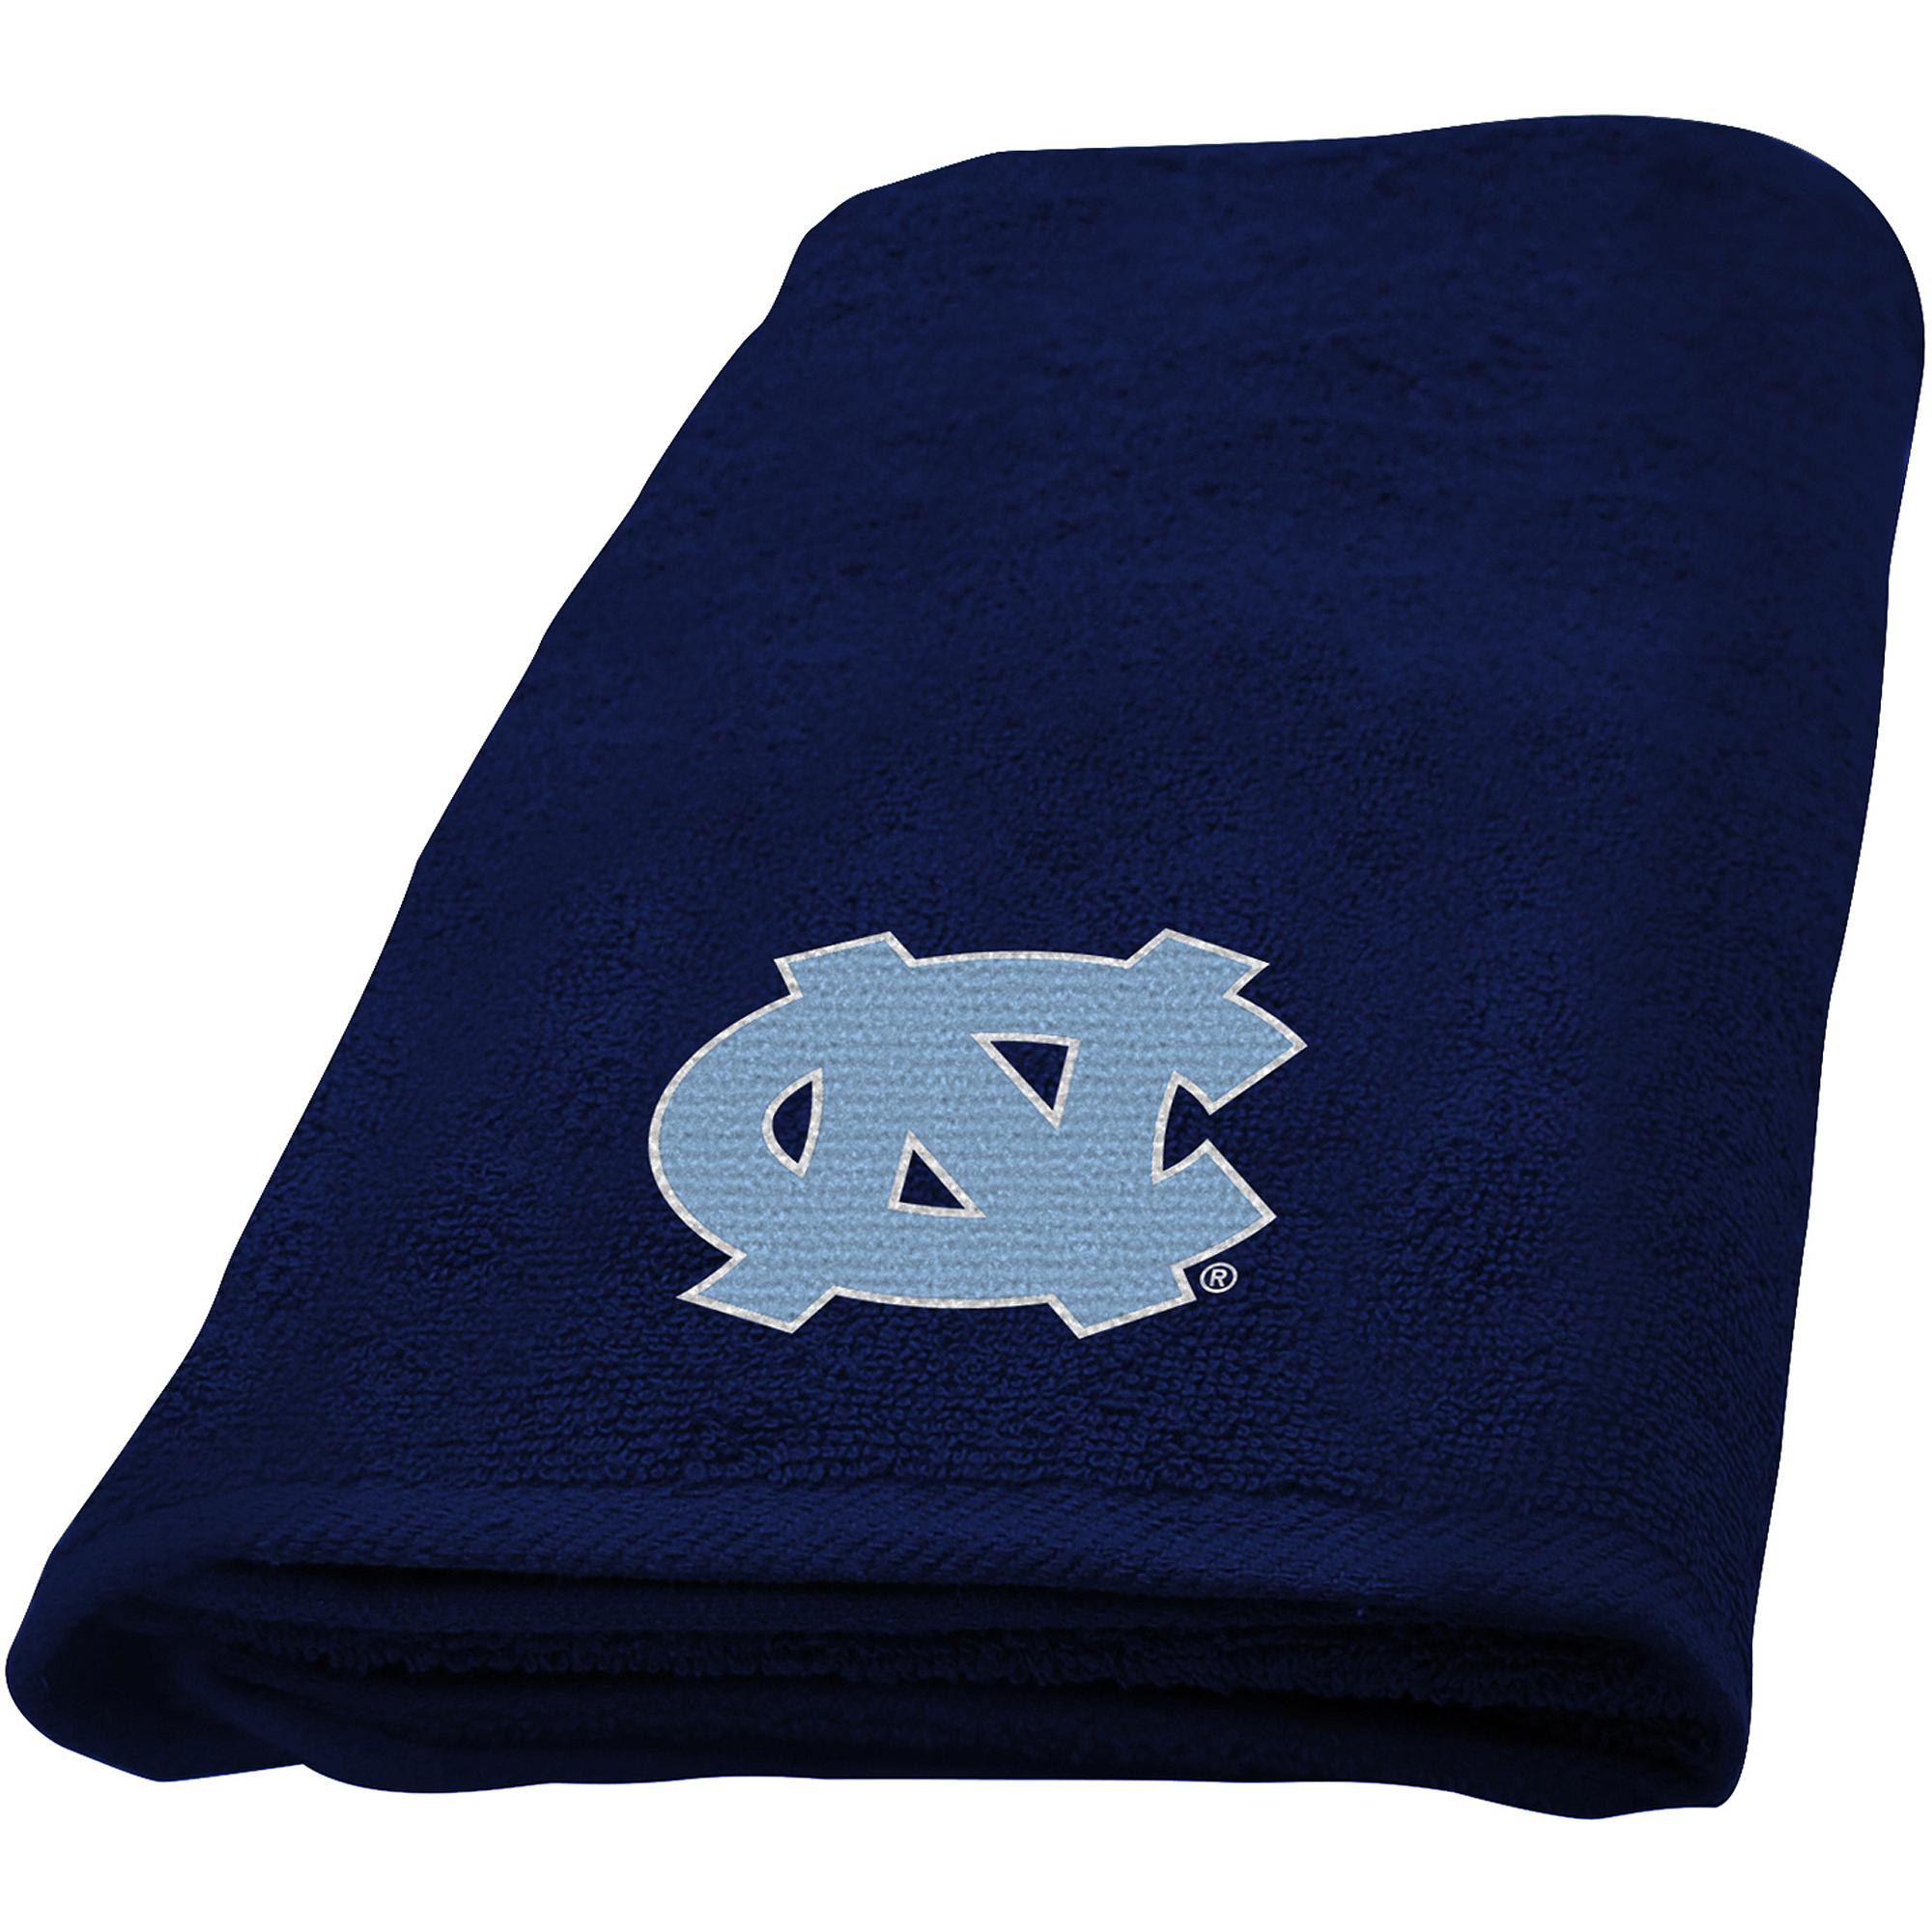 NCAA University of North Carolina Decorative Bath Collection - Fingertip Towel